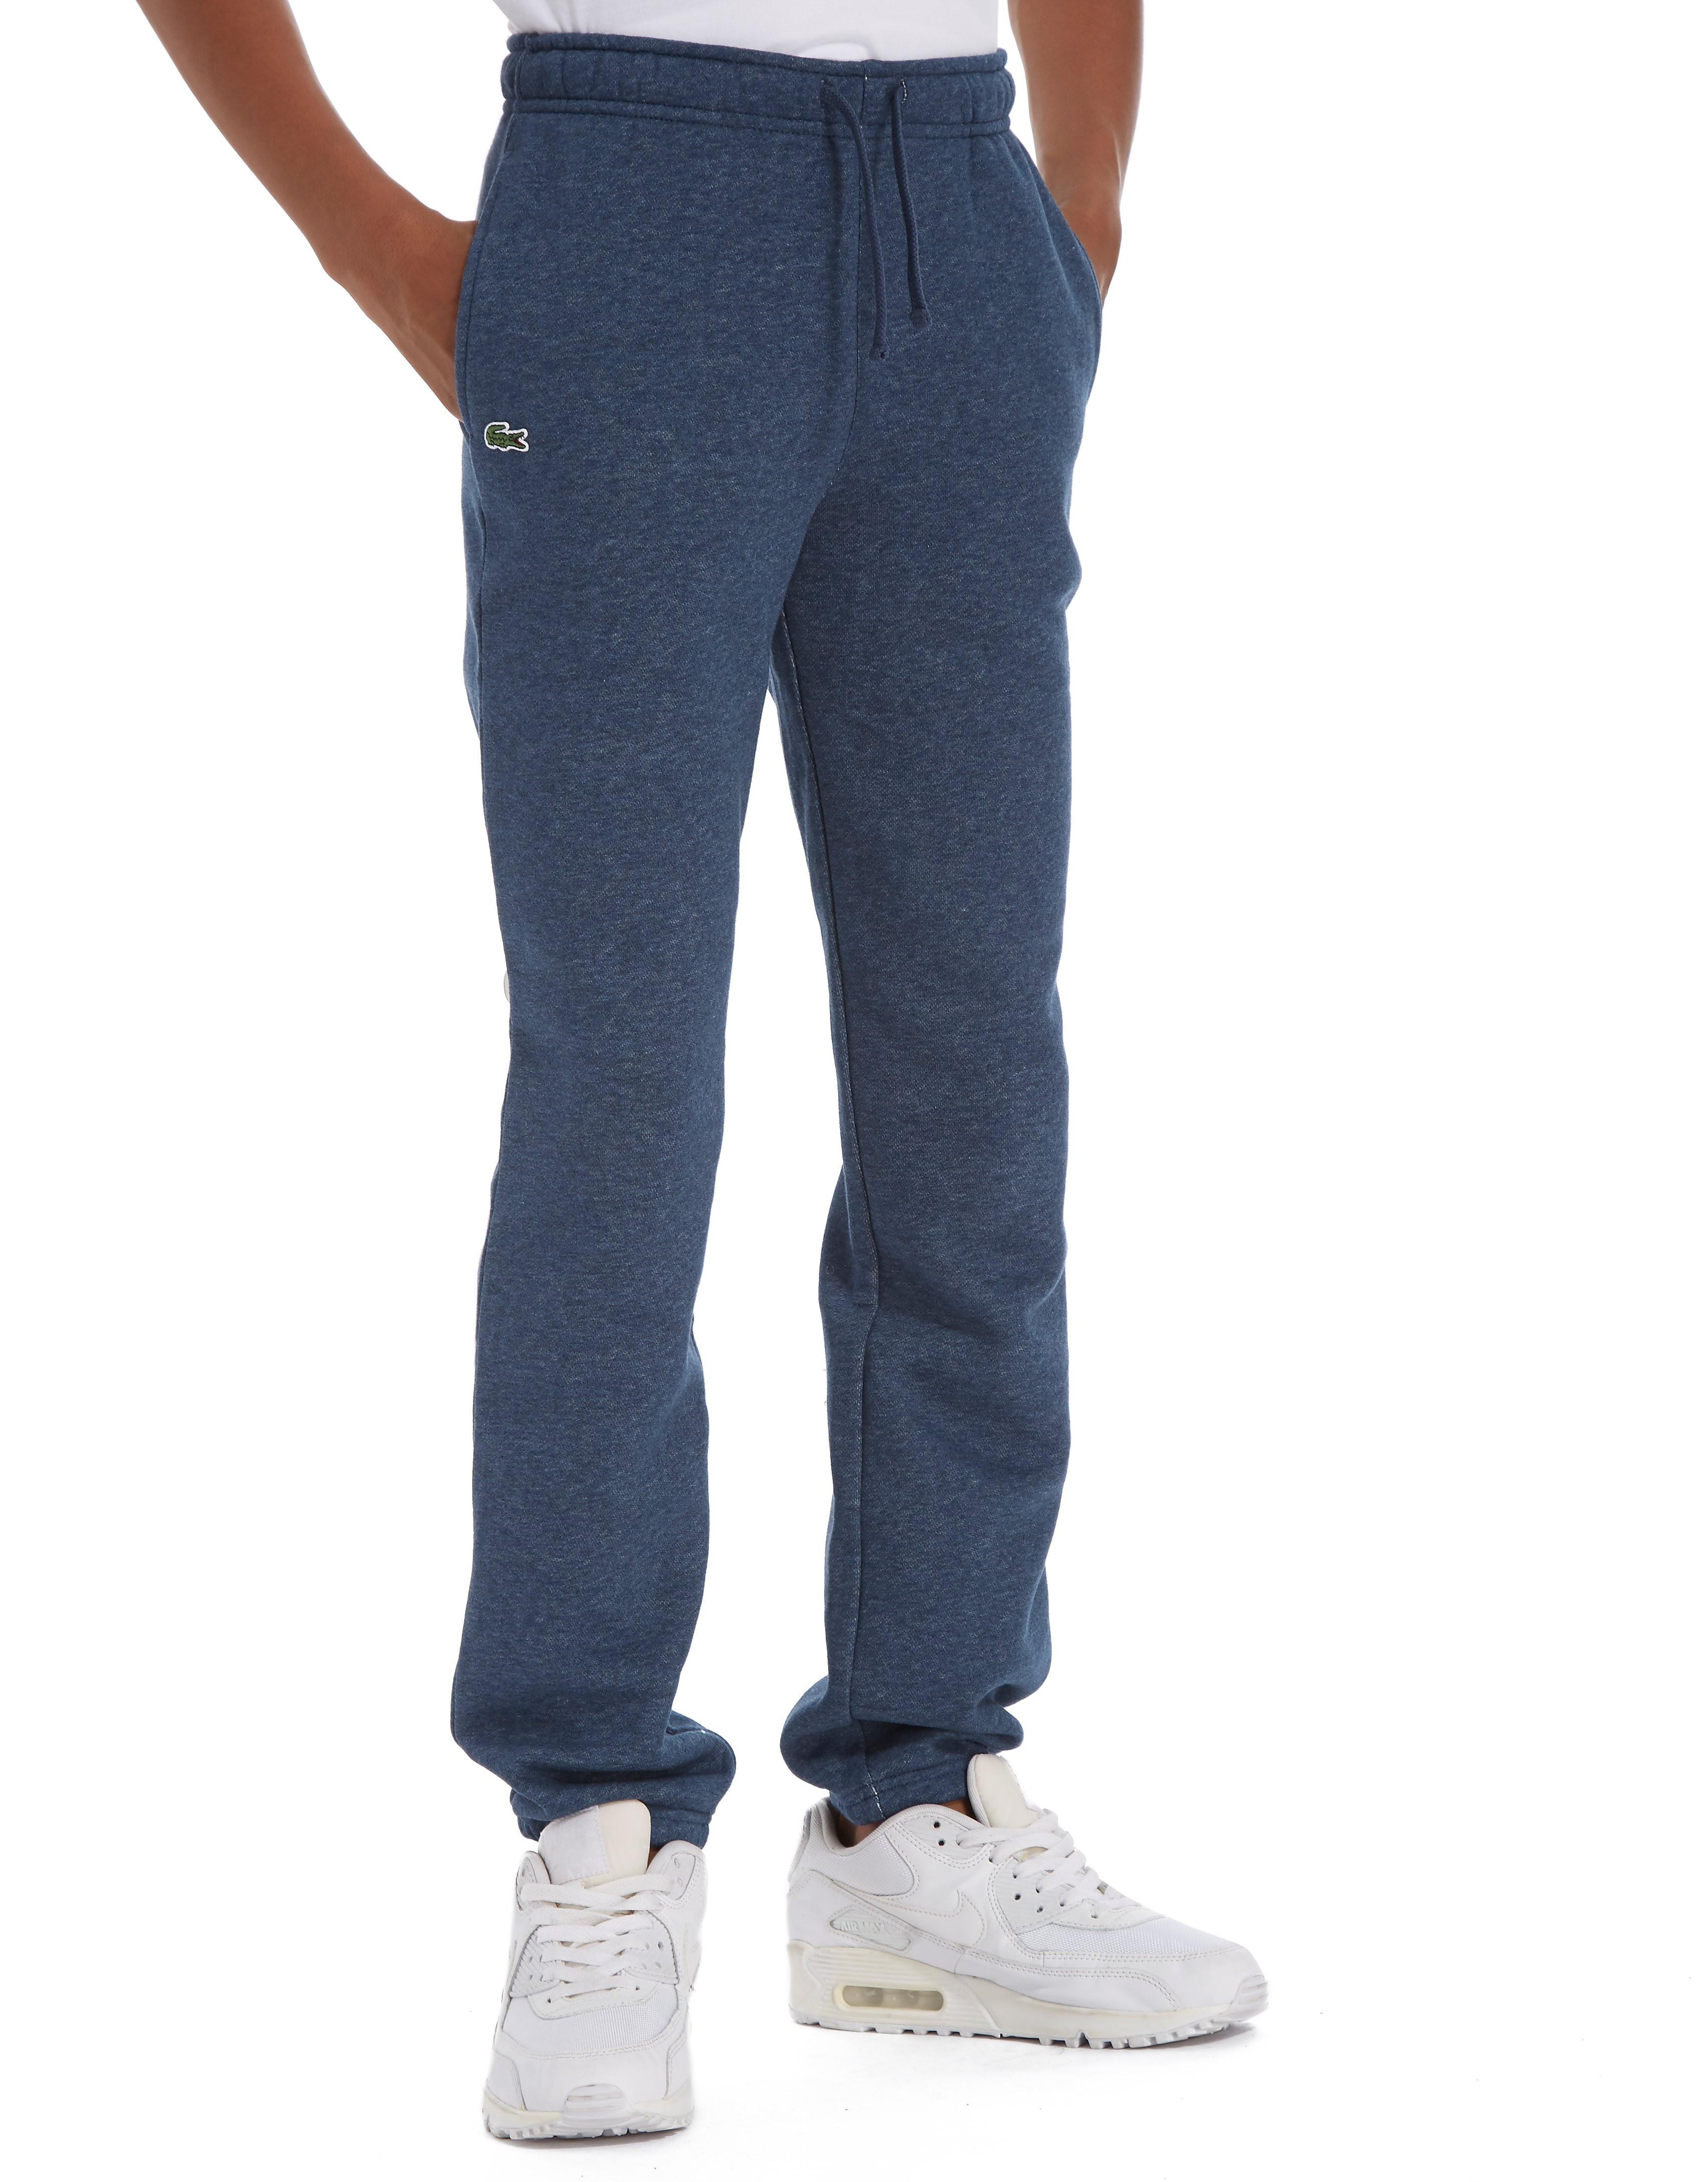 Lacoste Small Logo Pants Junior - Blauw - Kind